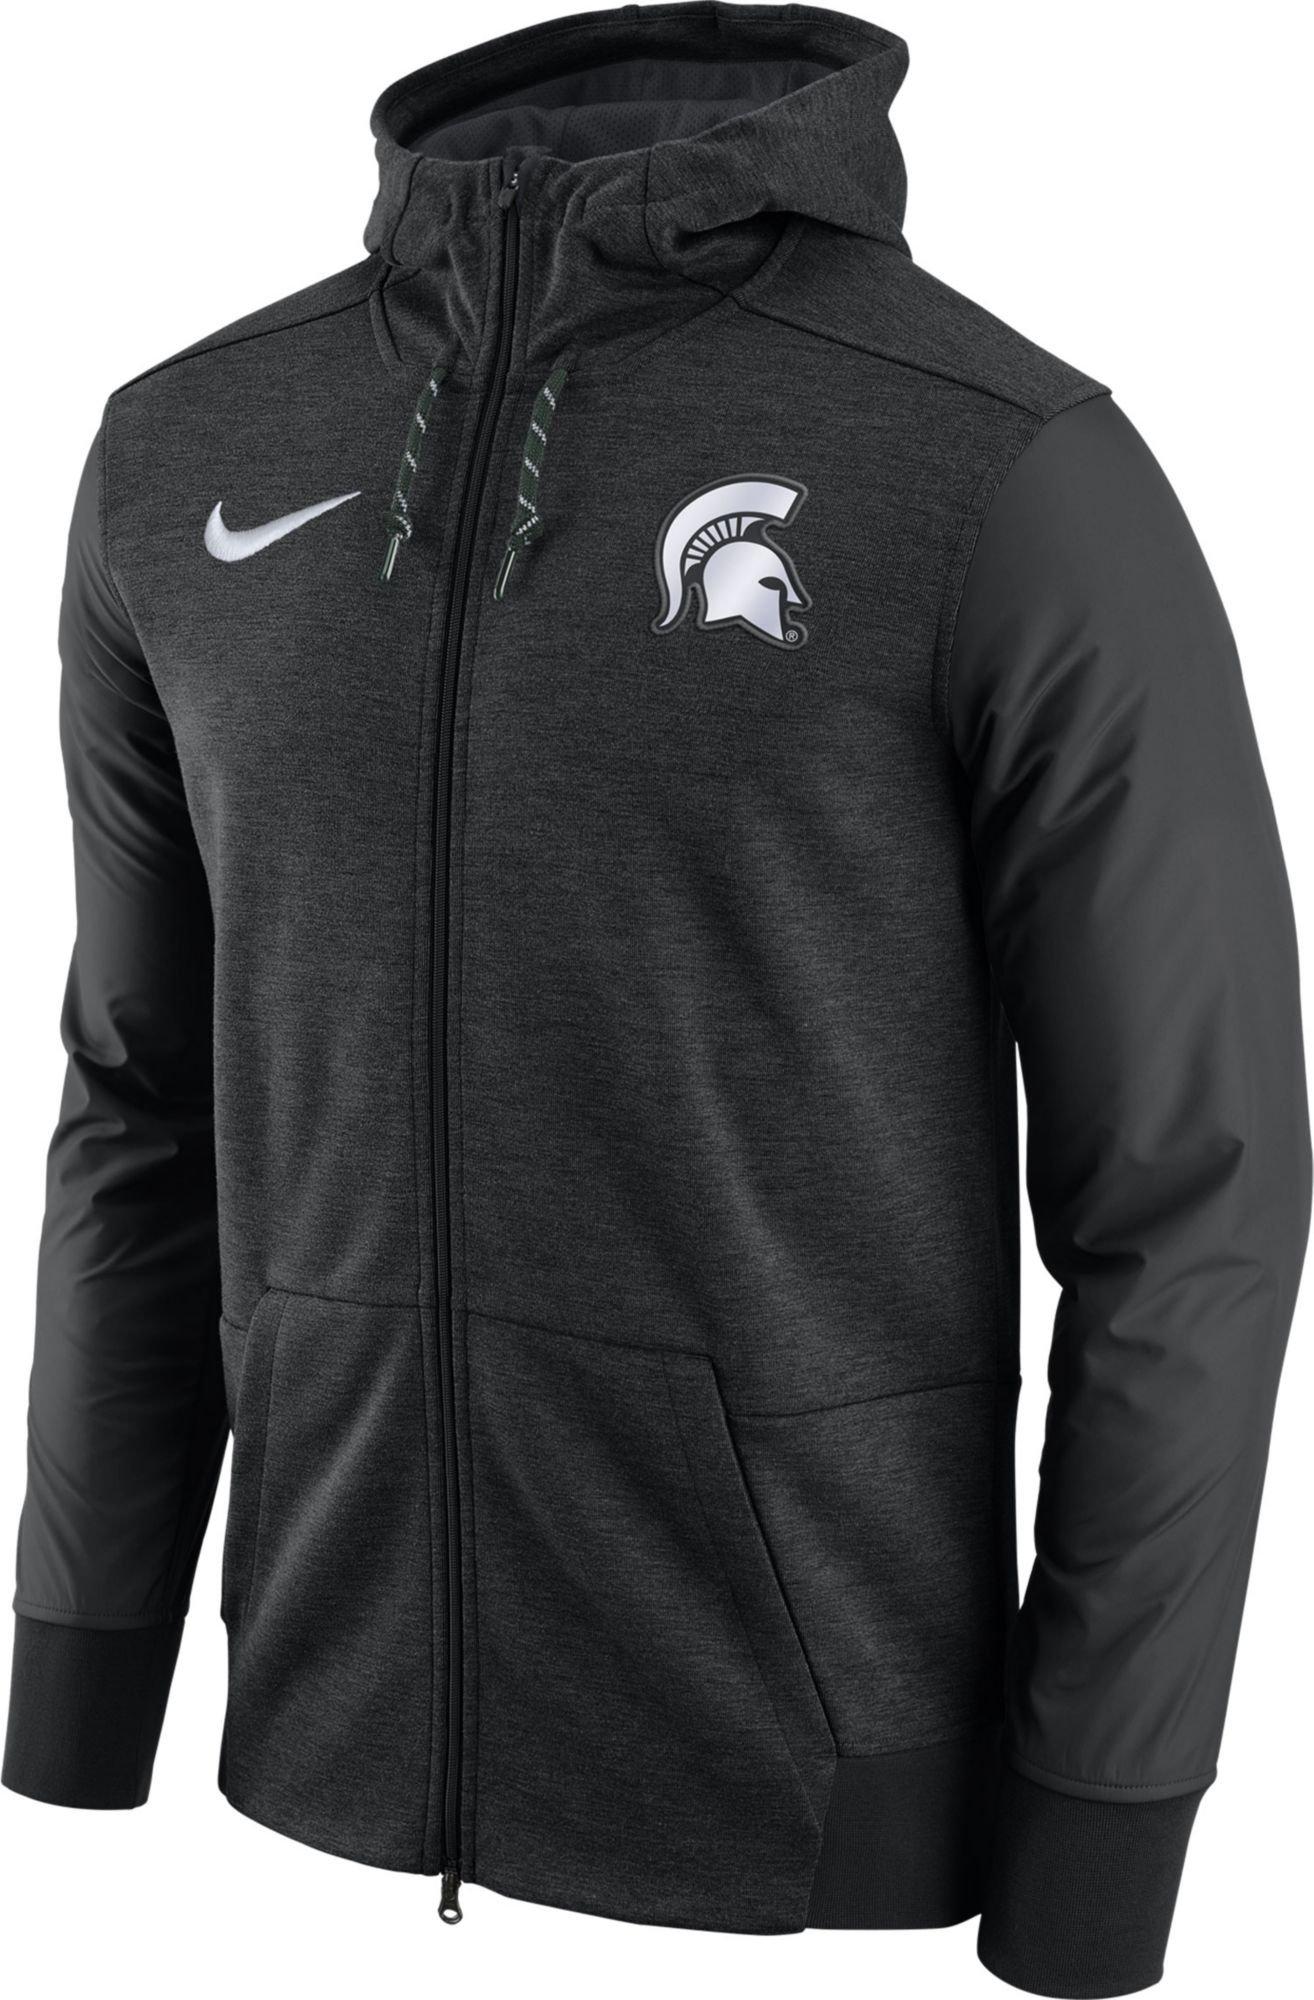 Nike Men's Michigan State Spartans Football Travel Heathered Black Full-Zip Hoodie (L)